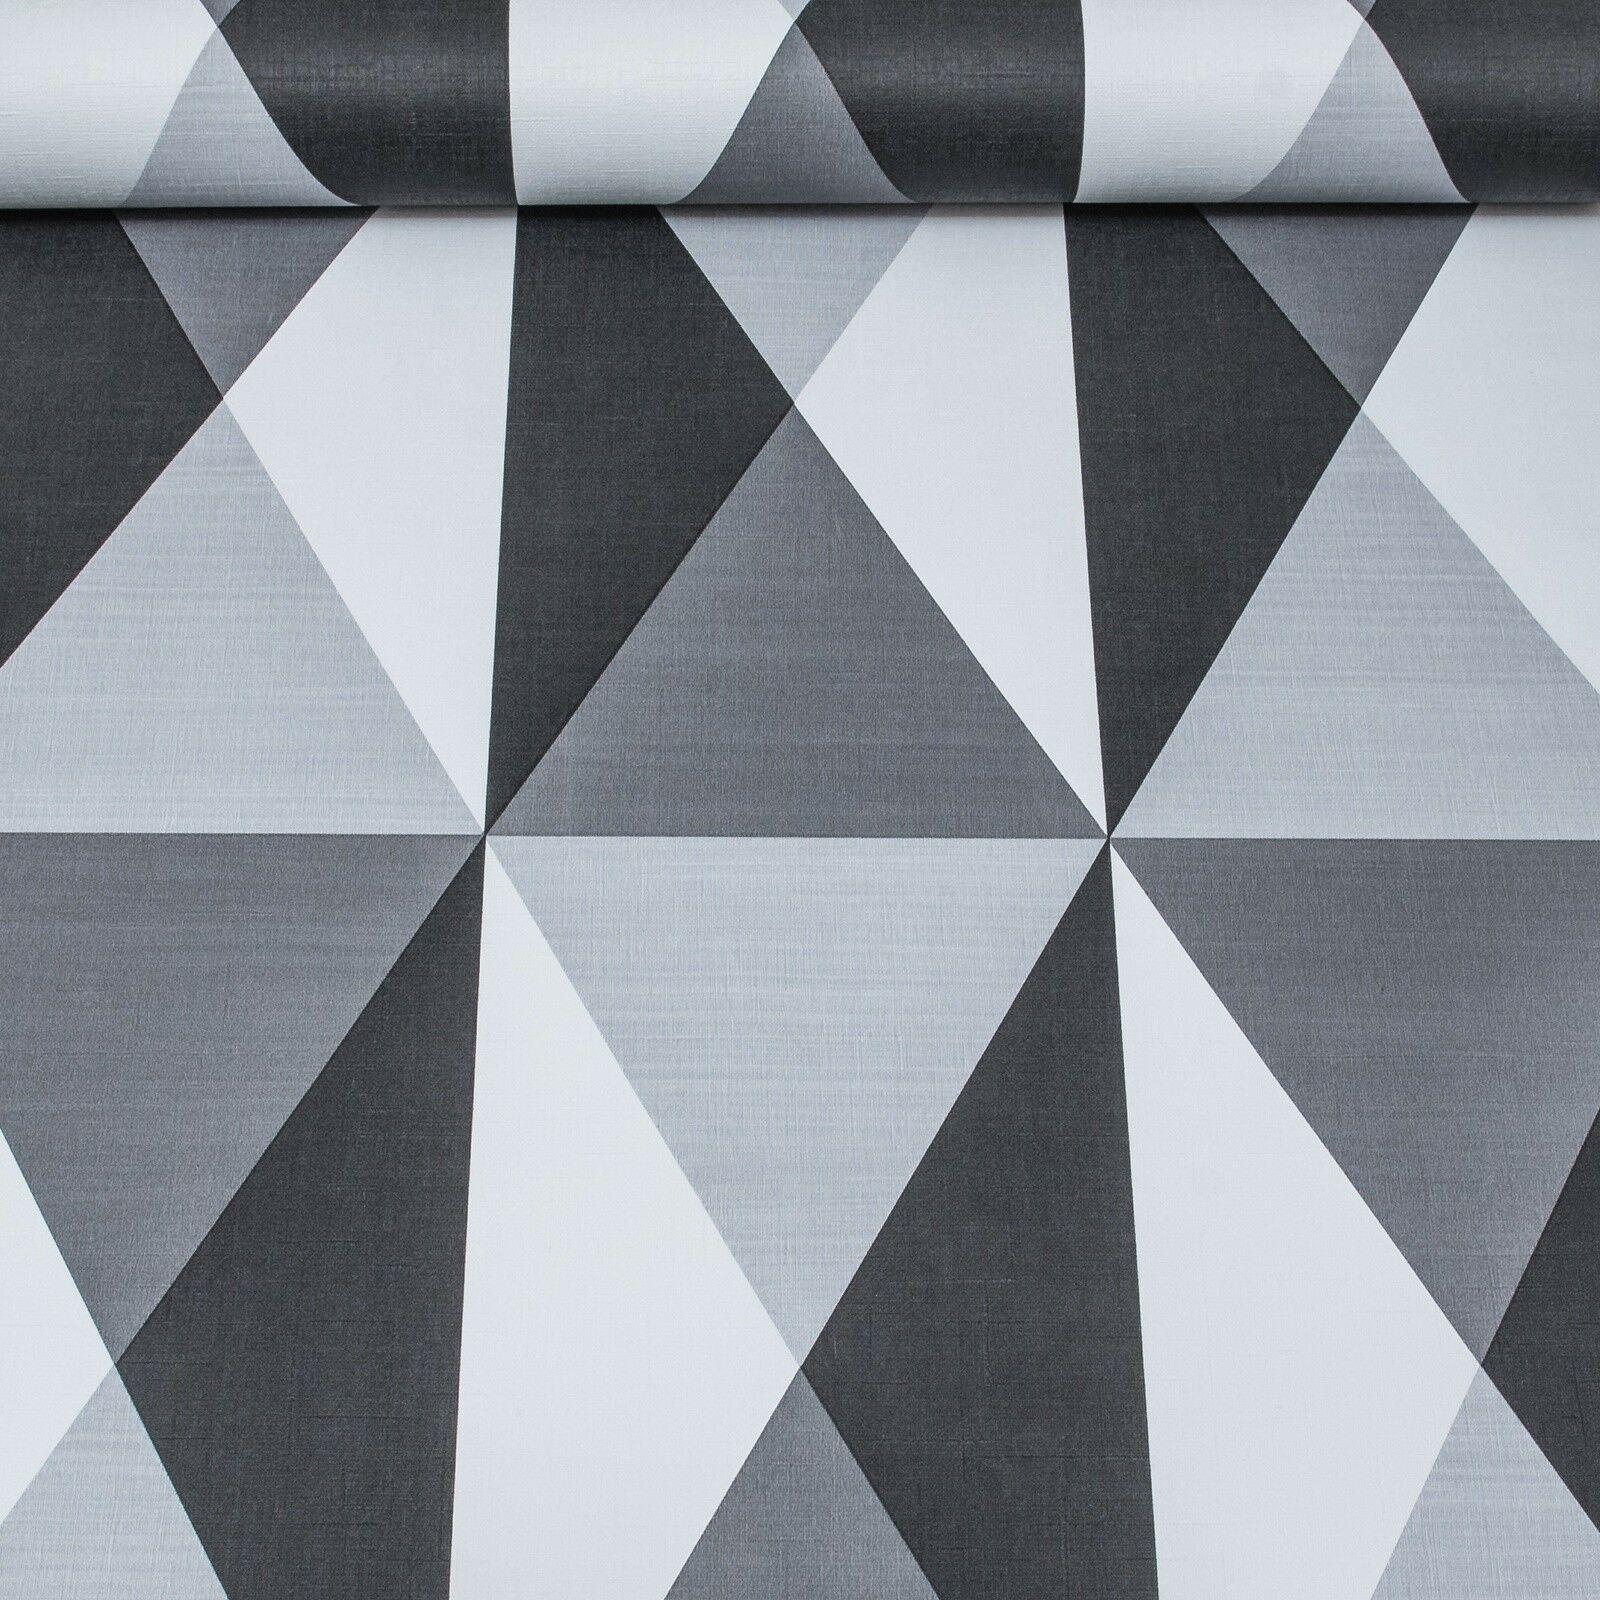 Ugepa 3d Geometric Triangles Diamond Wallpaper Grey Black White Vinyl Paste Wall Ebay